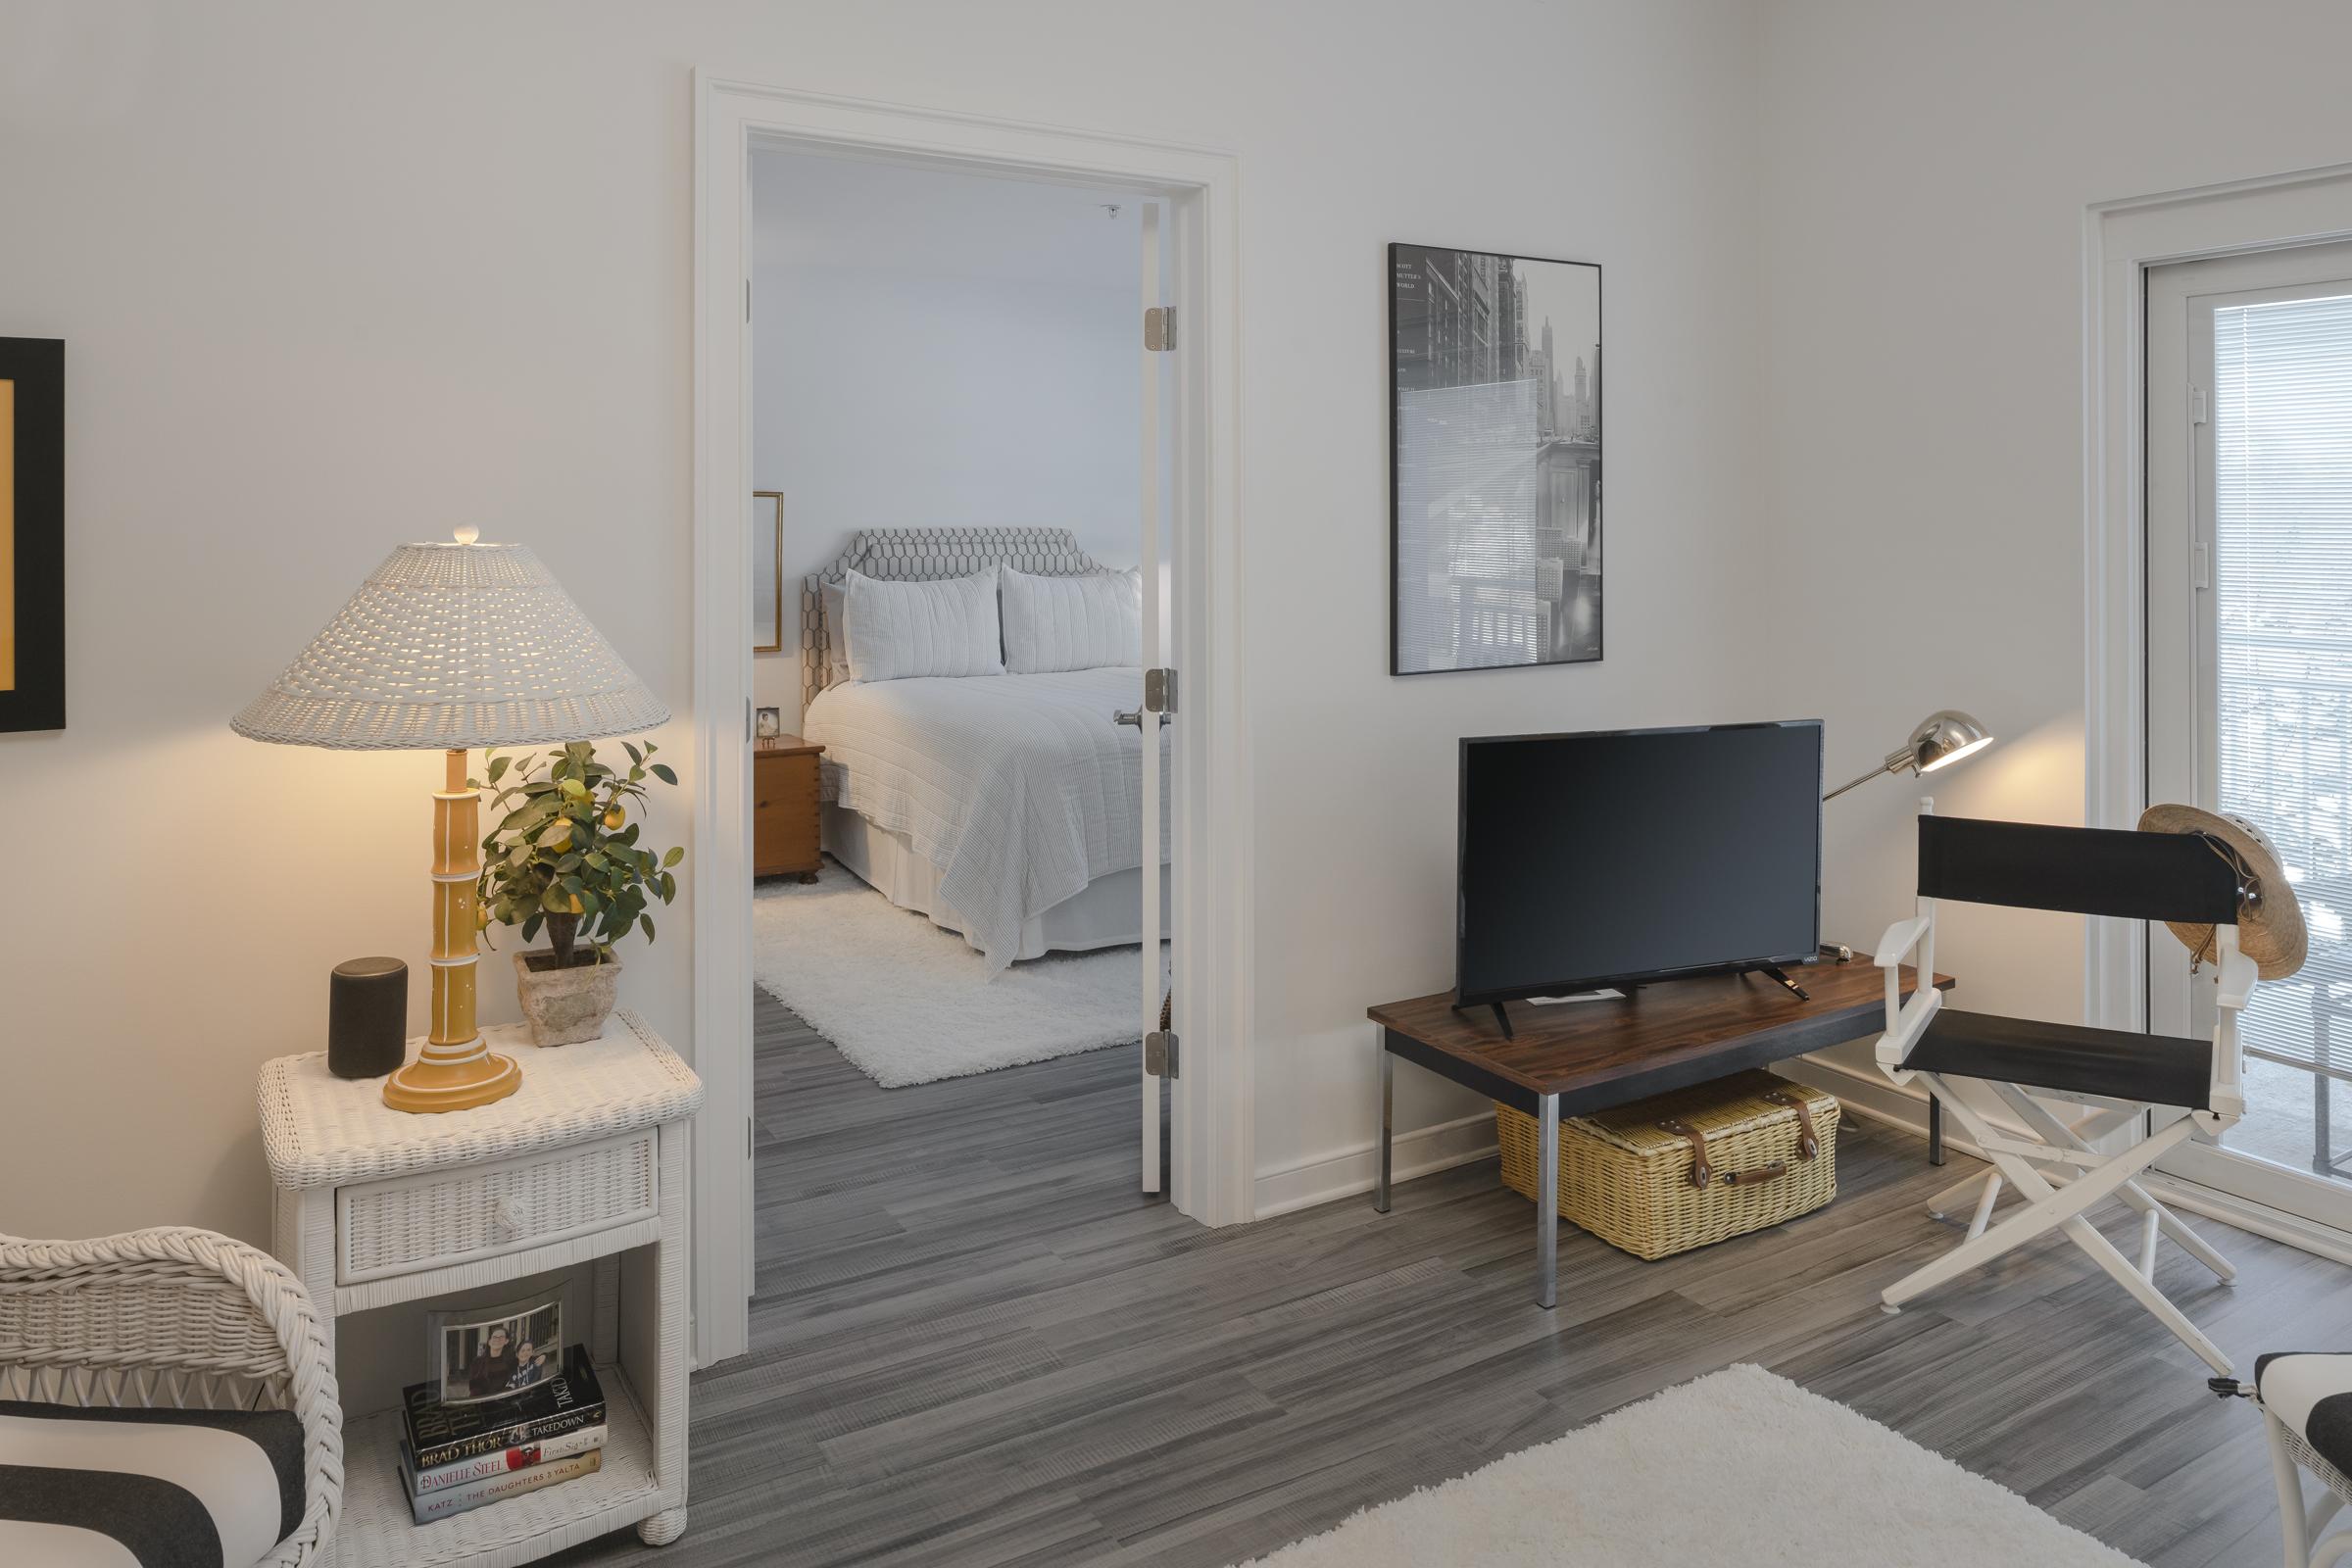 normandie ridge retirement apartments